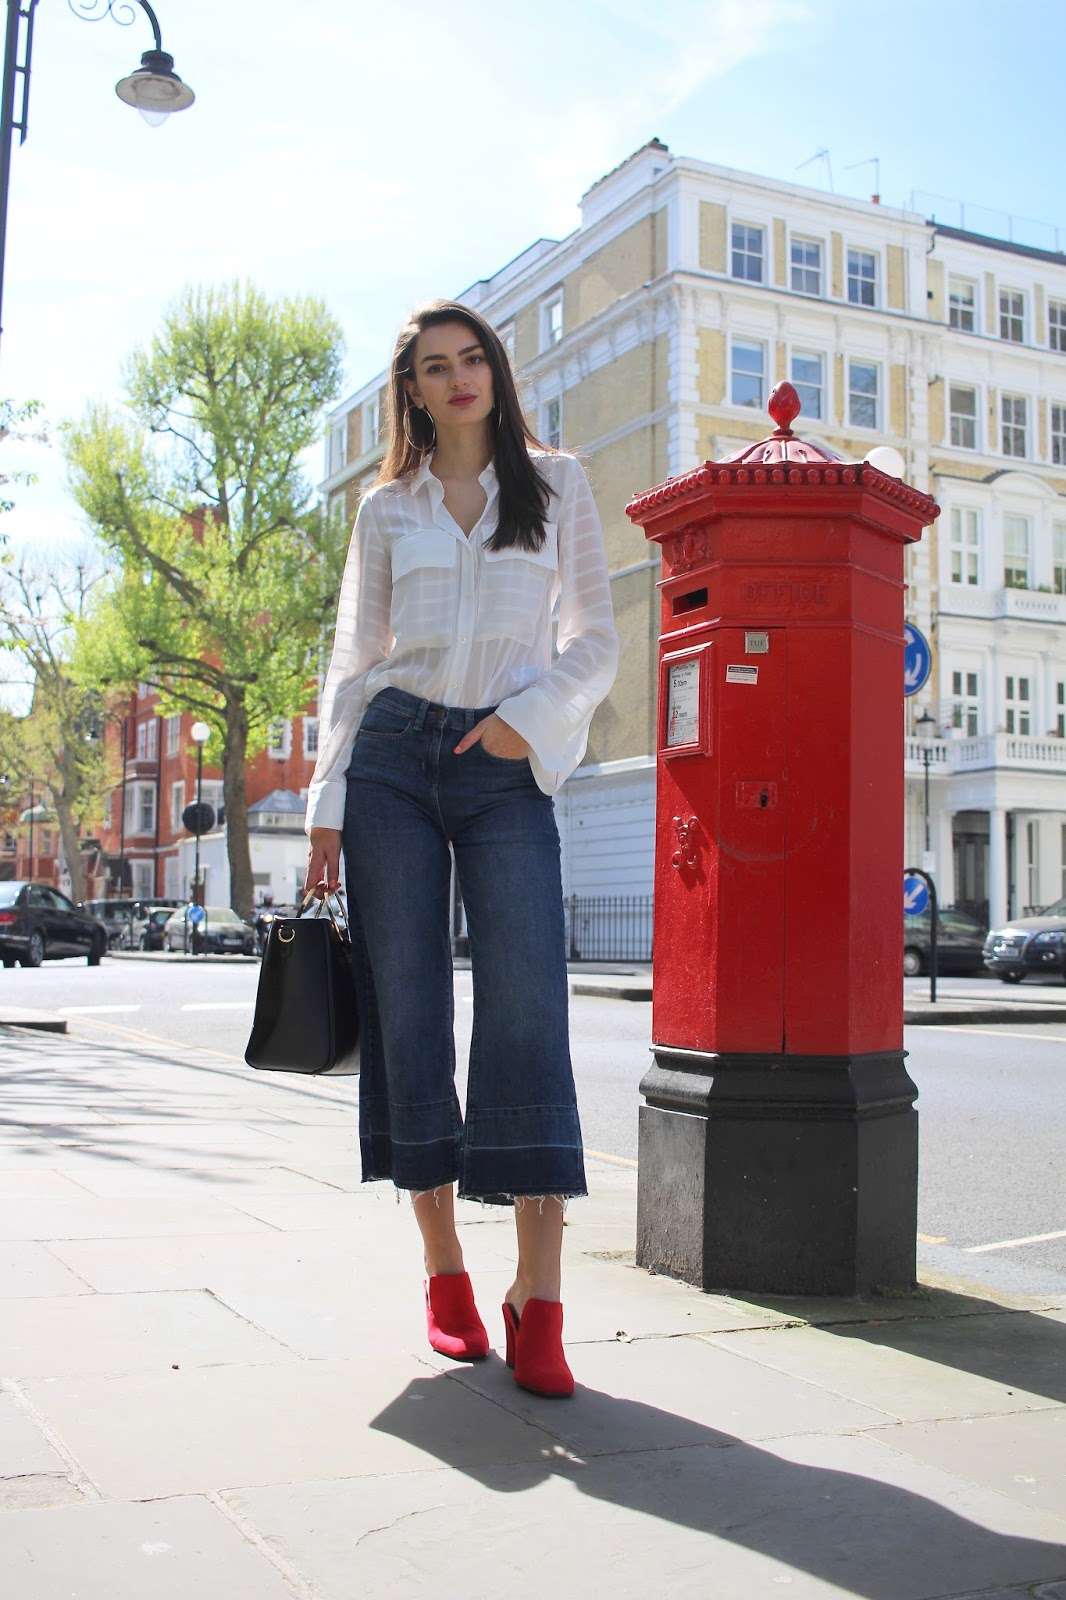 head-to-toe-next peexo spring style blogger london